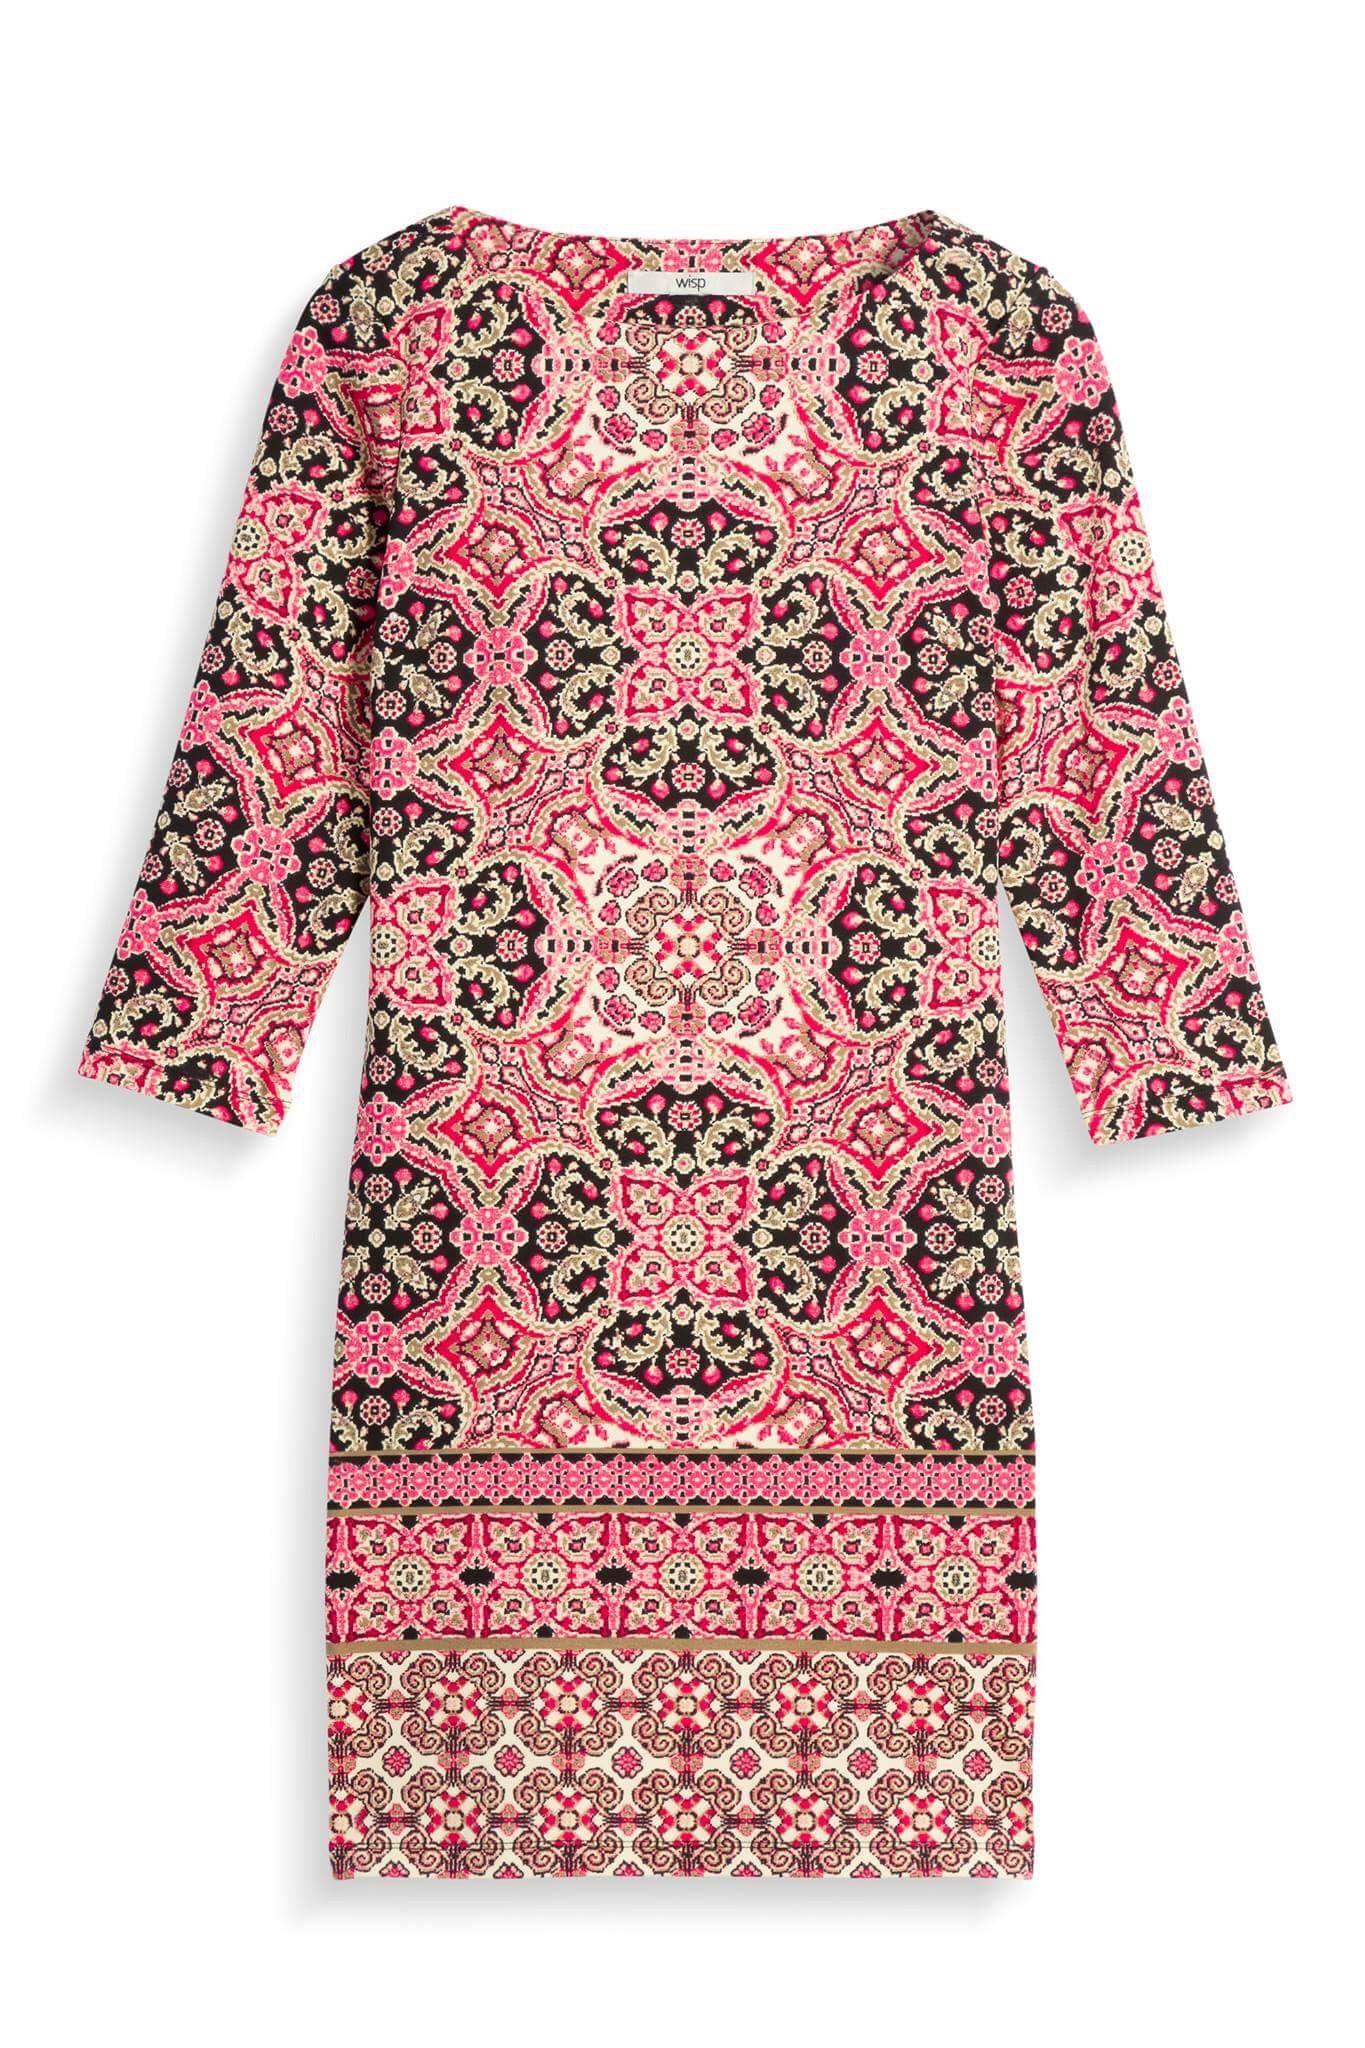 Wisp mandala pattern sheath dress, 3/4 sleeve, black gold pink multi ...